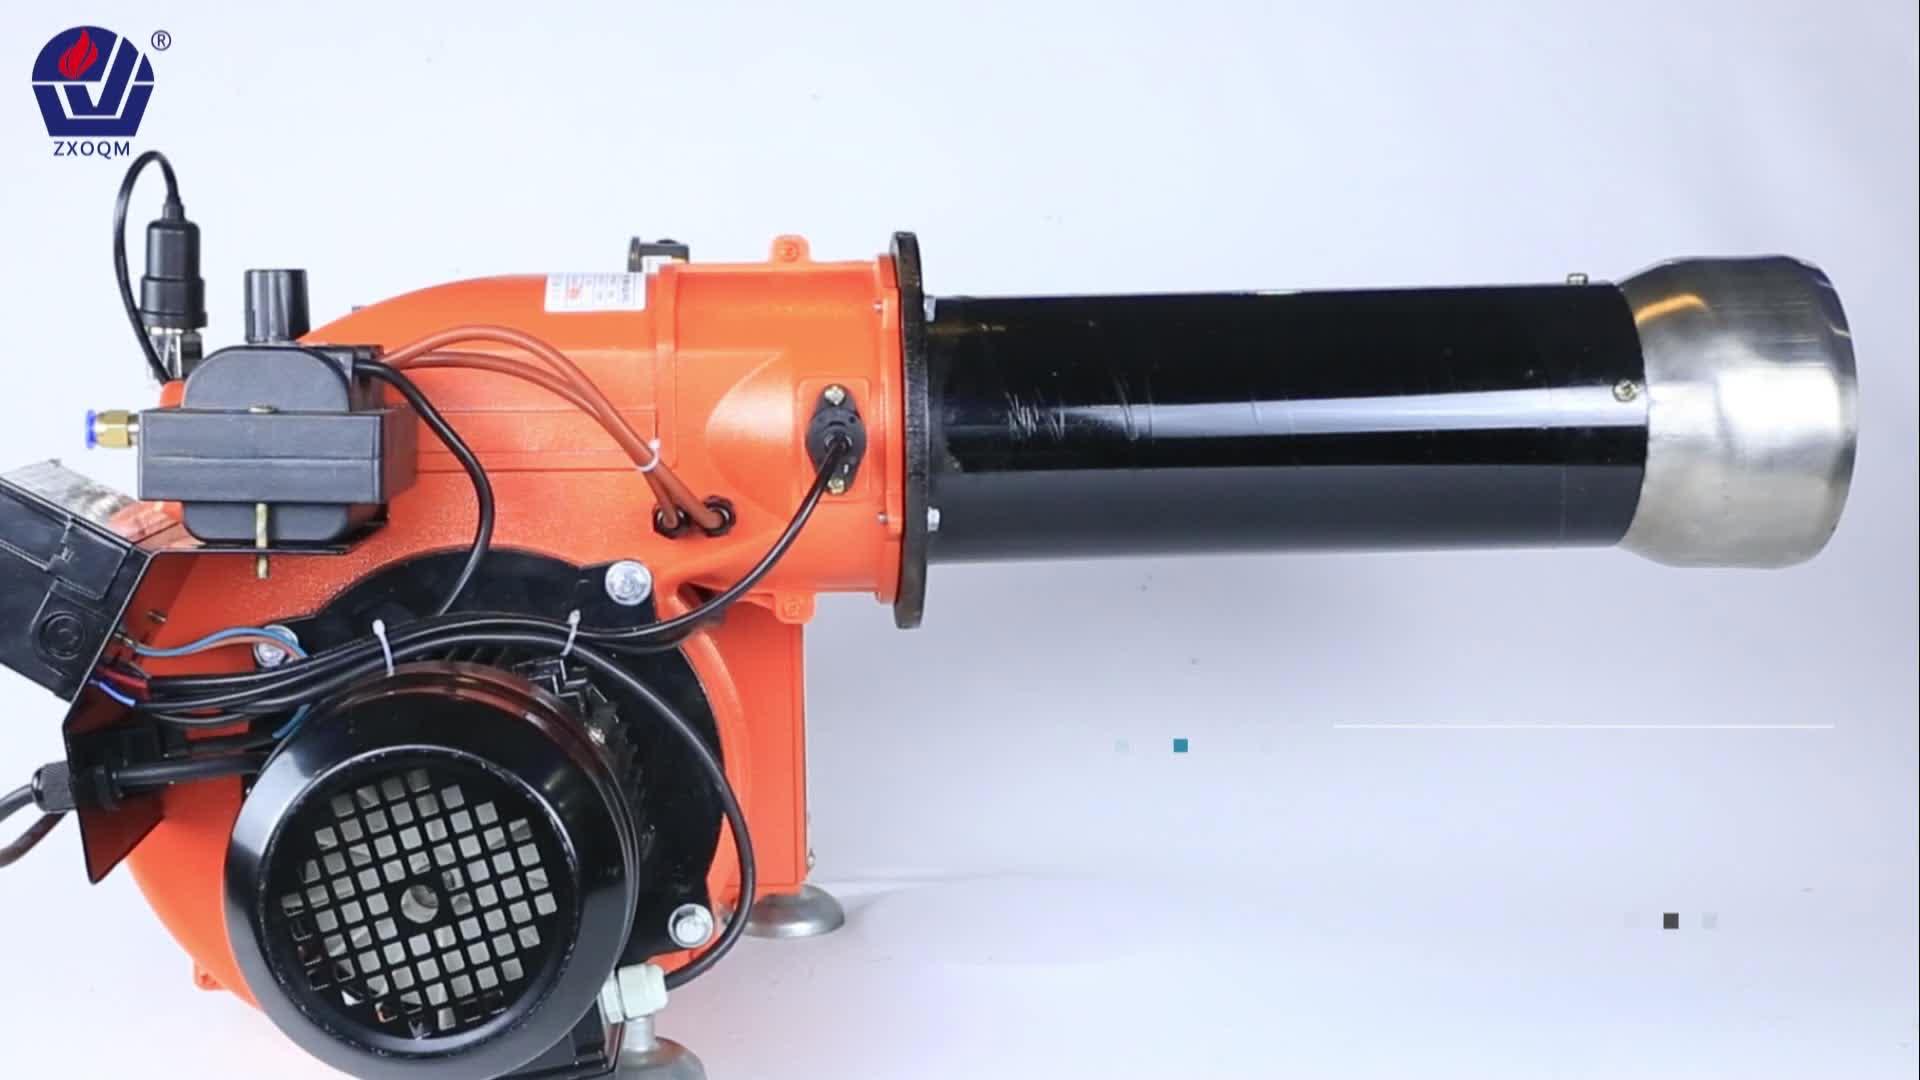 Kualitas tinggi Bahan Bakar Diesel Limbah Minyak Burner Untuk Dijual